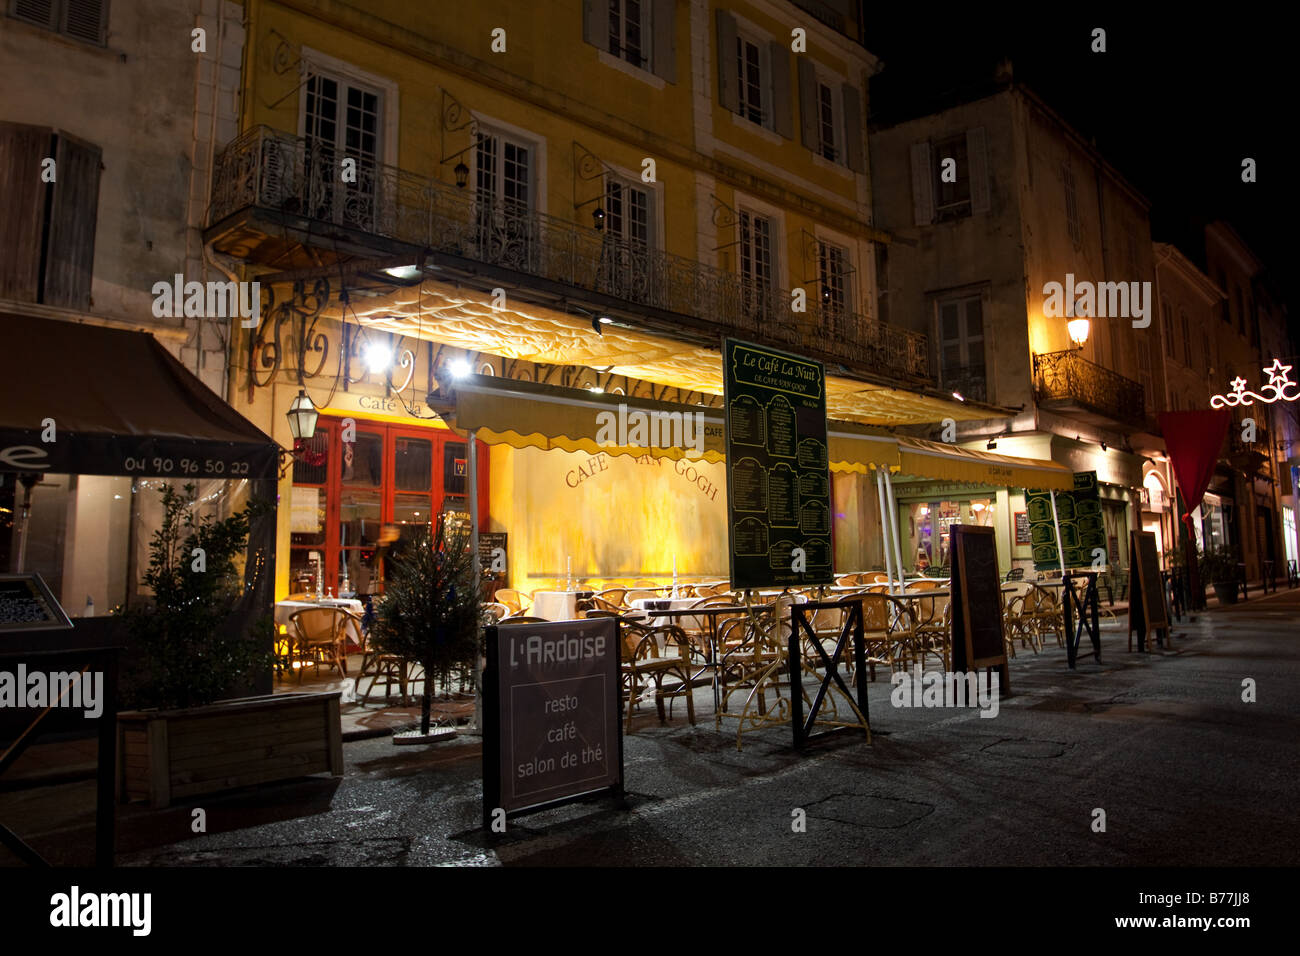 Cafe Van Gogh In Arles Le Cafe Le Nuit Cafe Terrasse De La Nuit